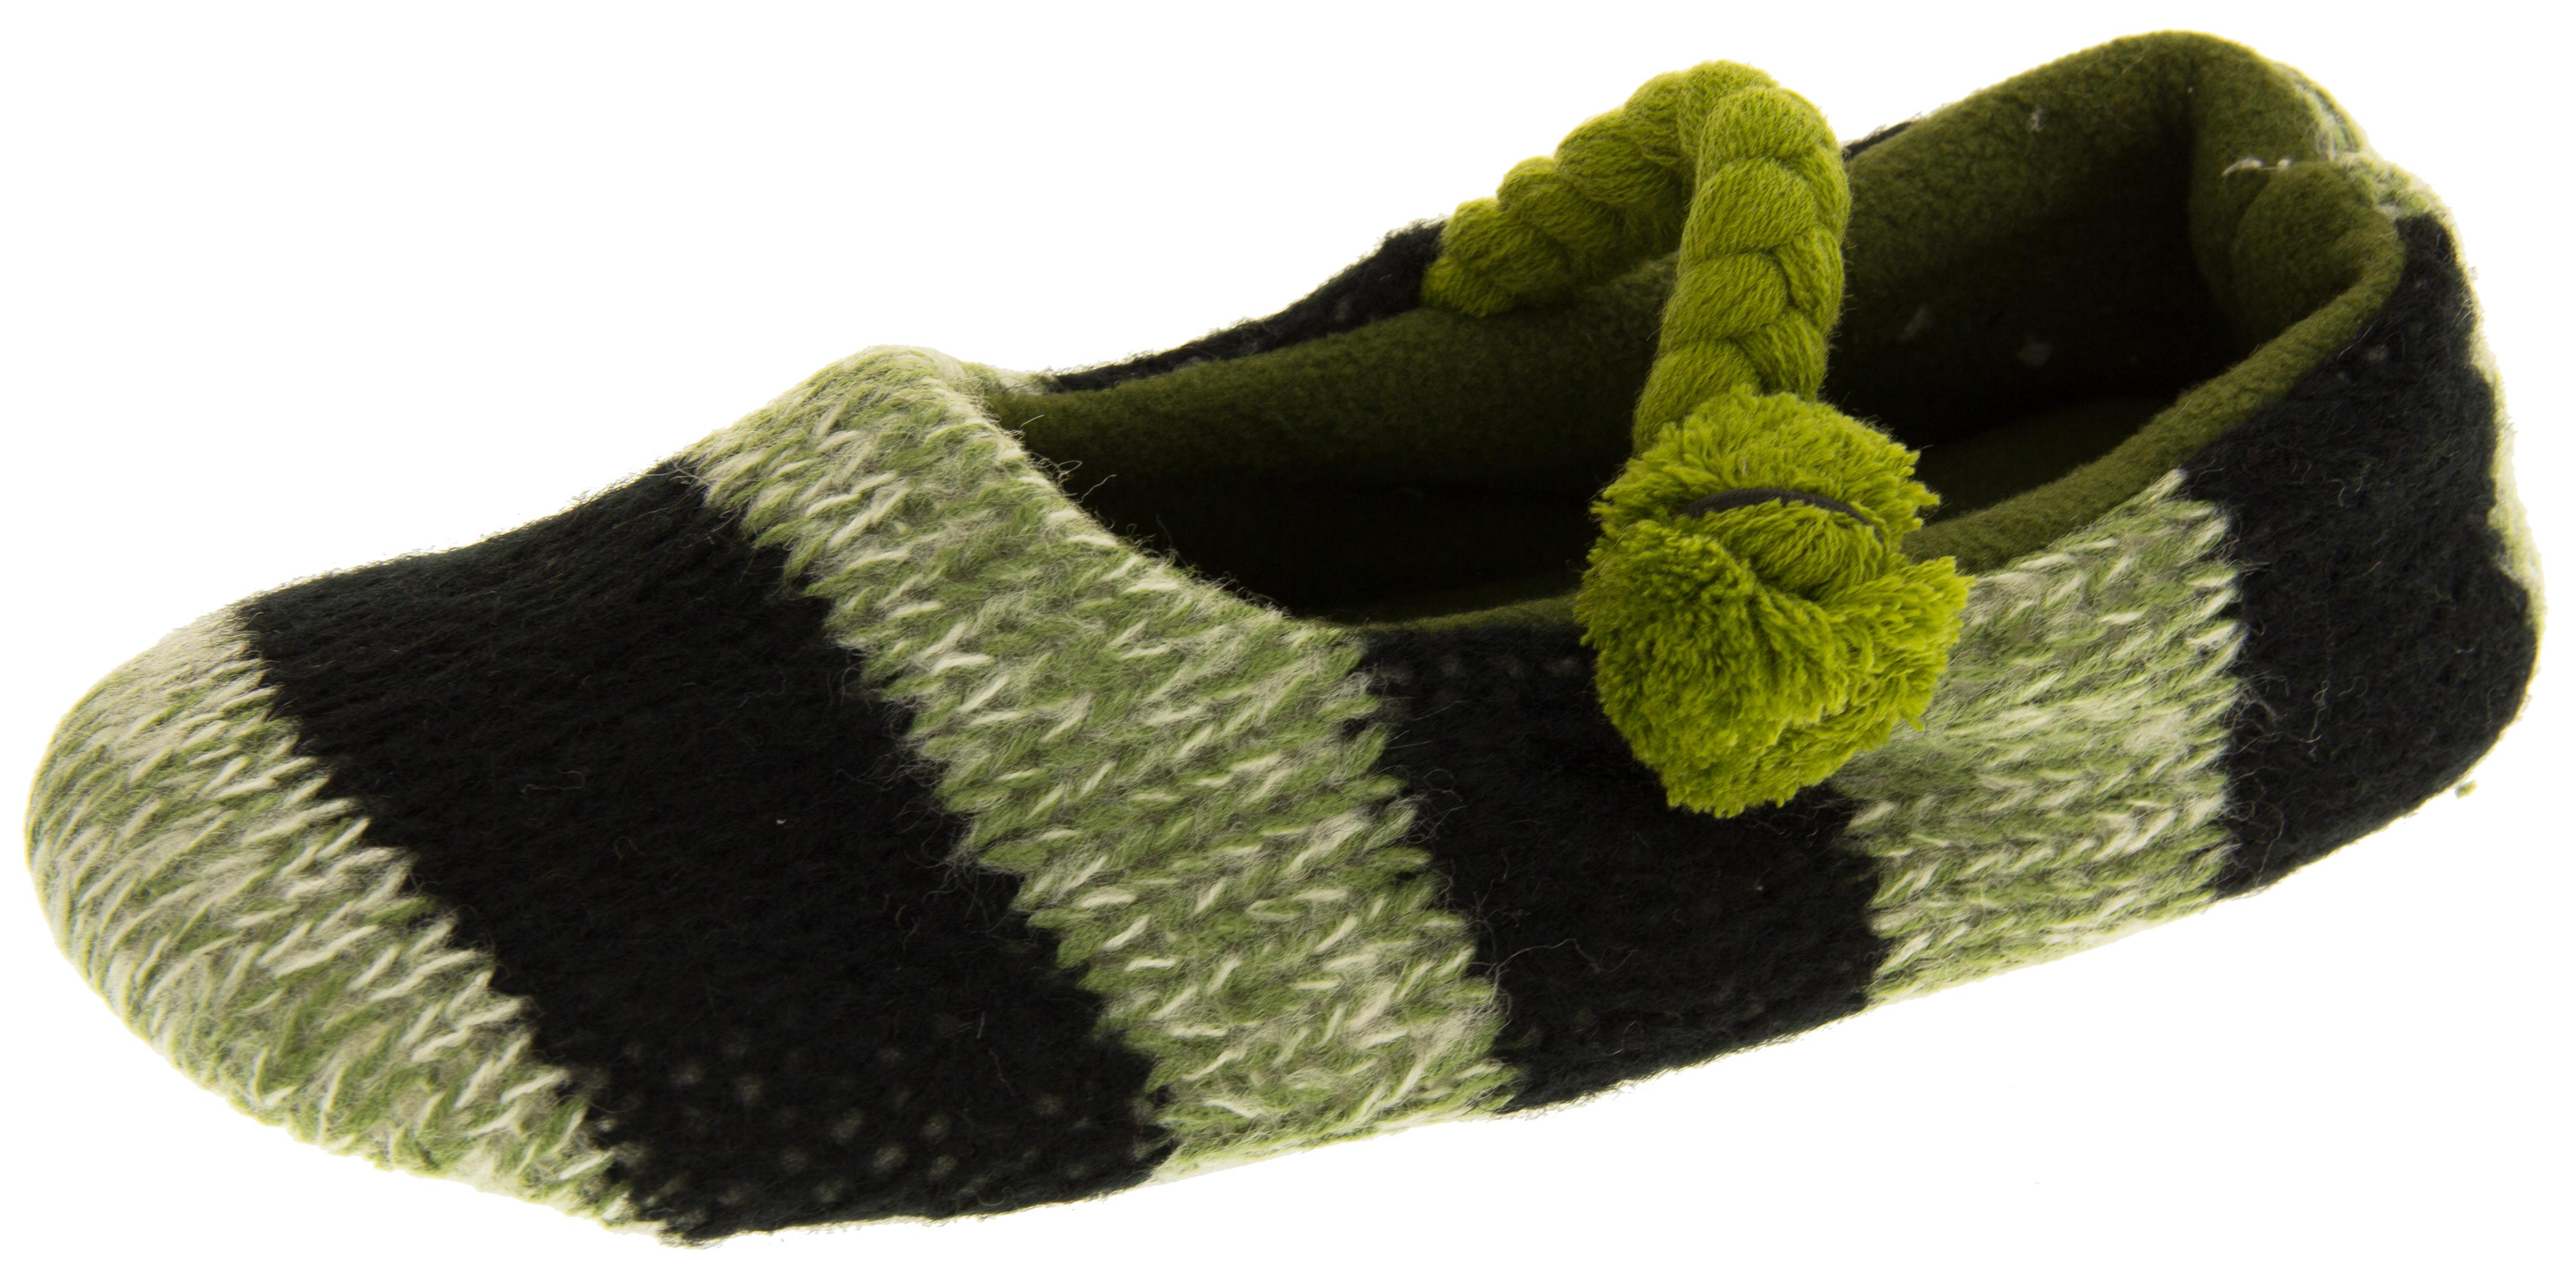 Kumfipumps Womens Knitted Ballerina Slippers CH_6945